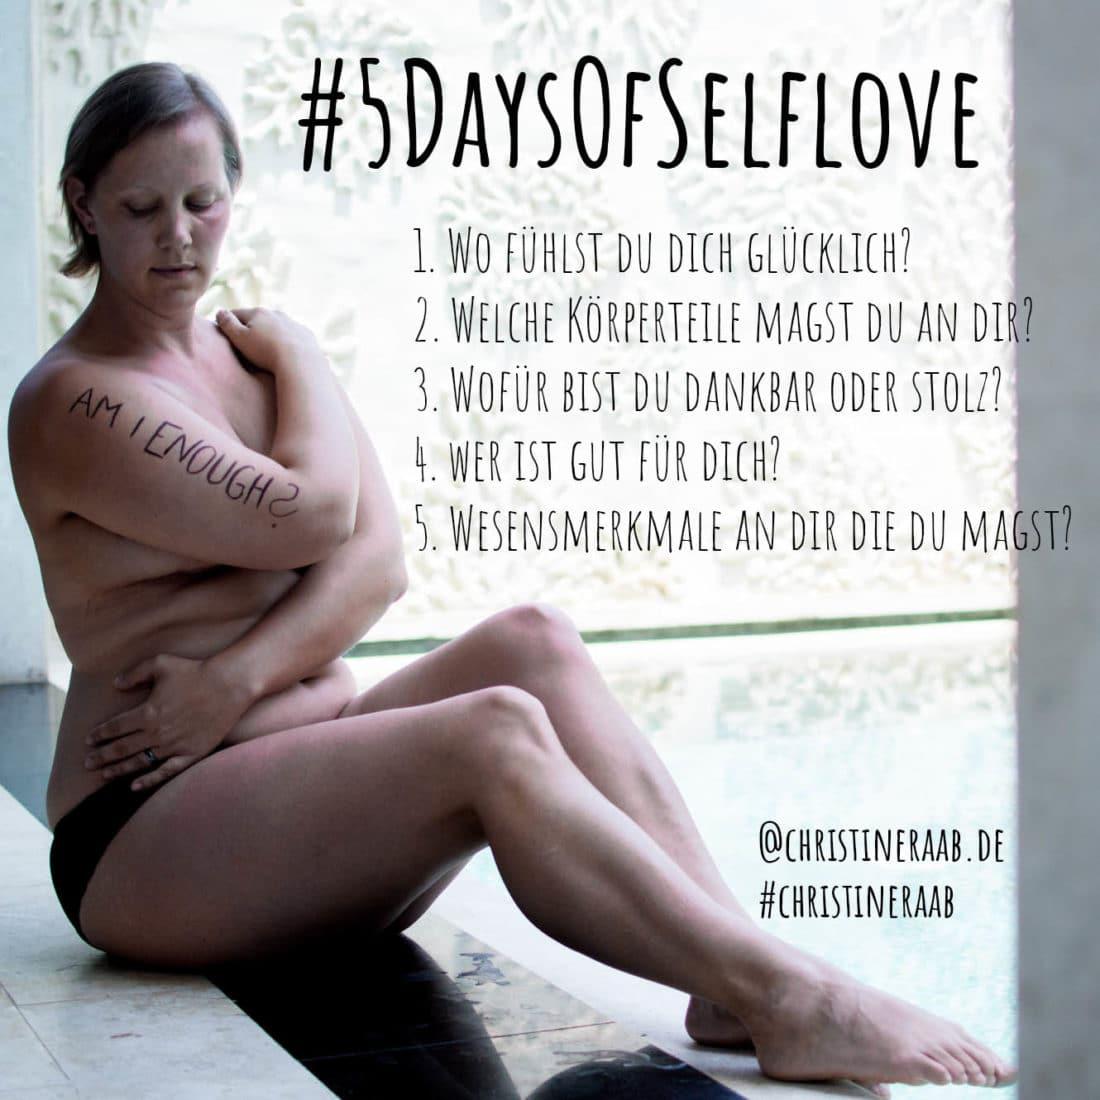 Selflove, Selbstzweifel, Challenge